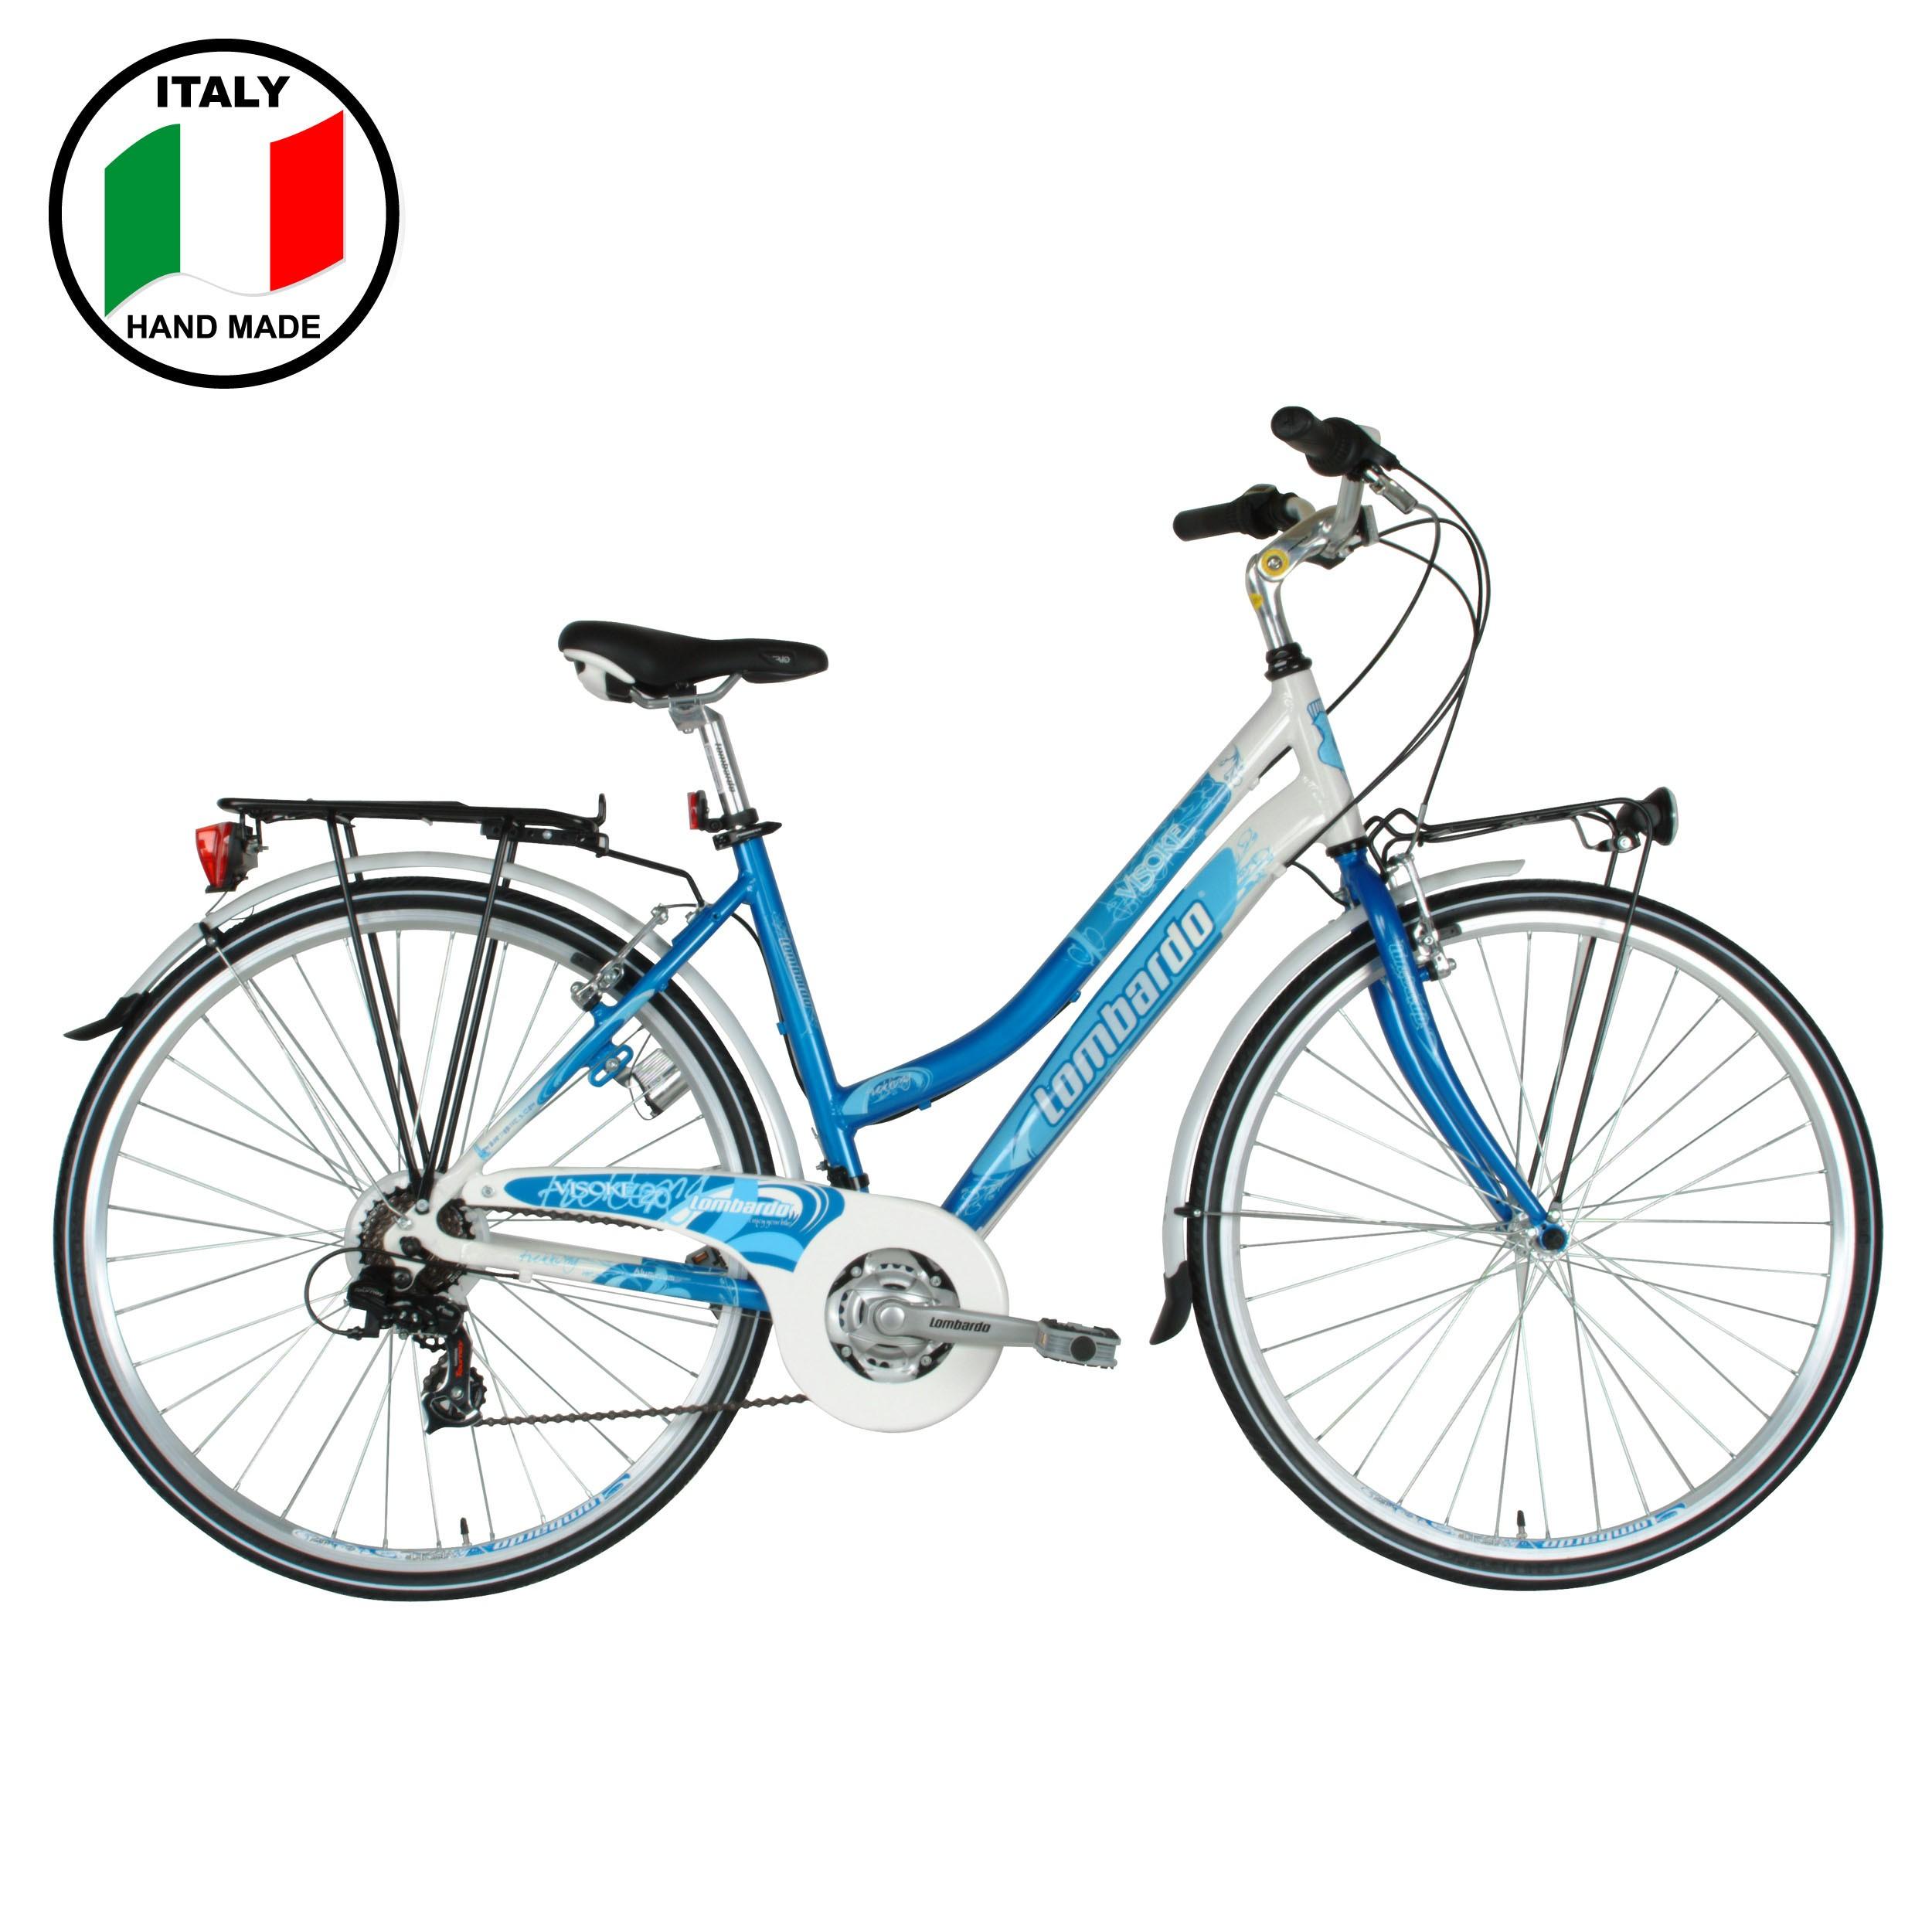 Lombardo Visoke Women's 17 inch Bike (Multiple Colors)